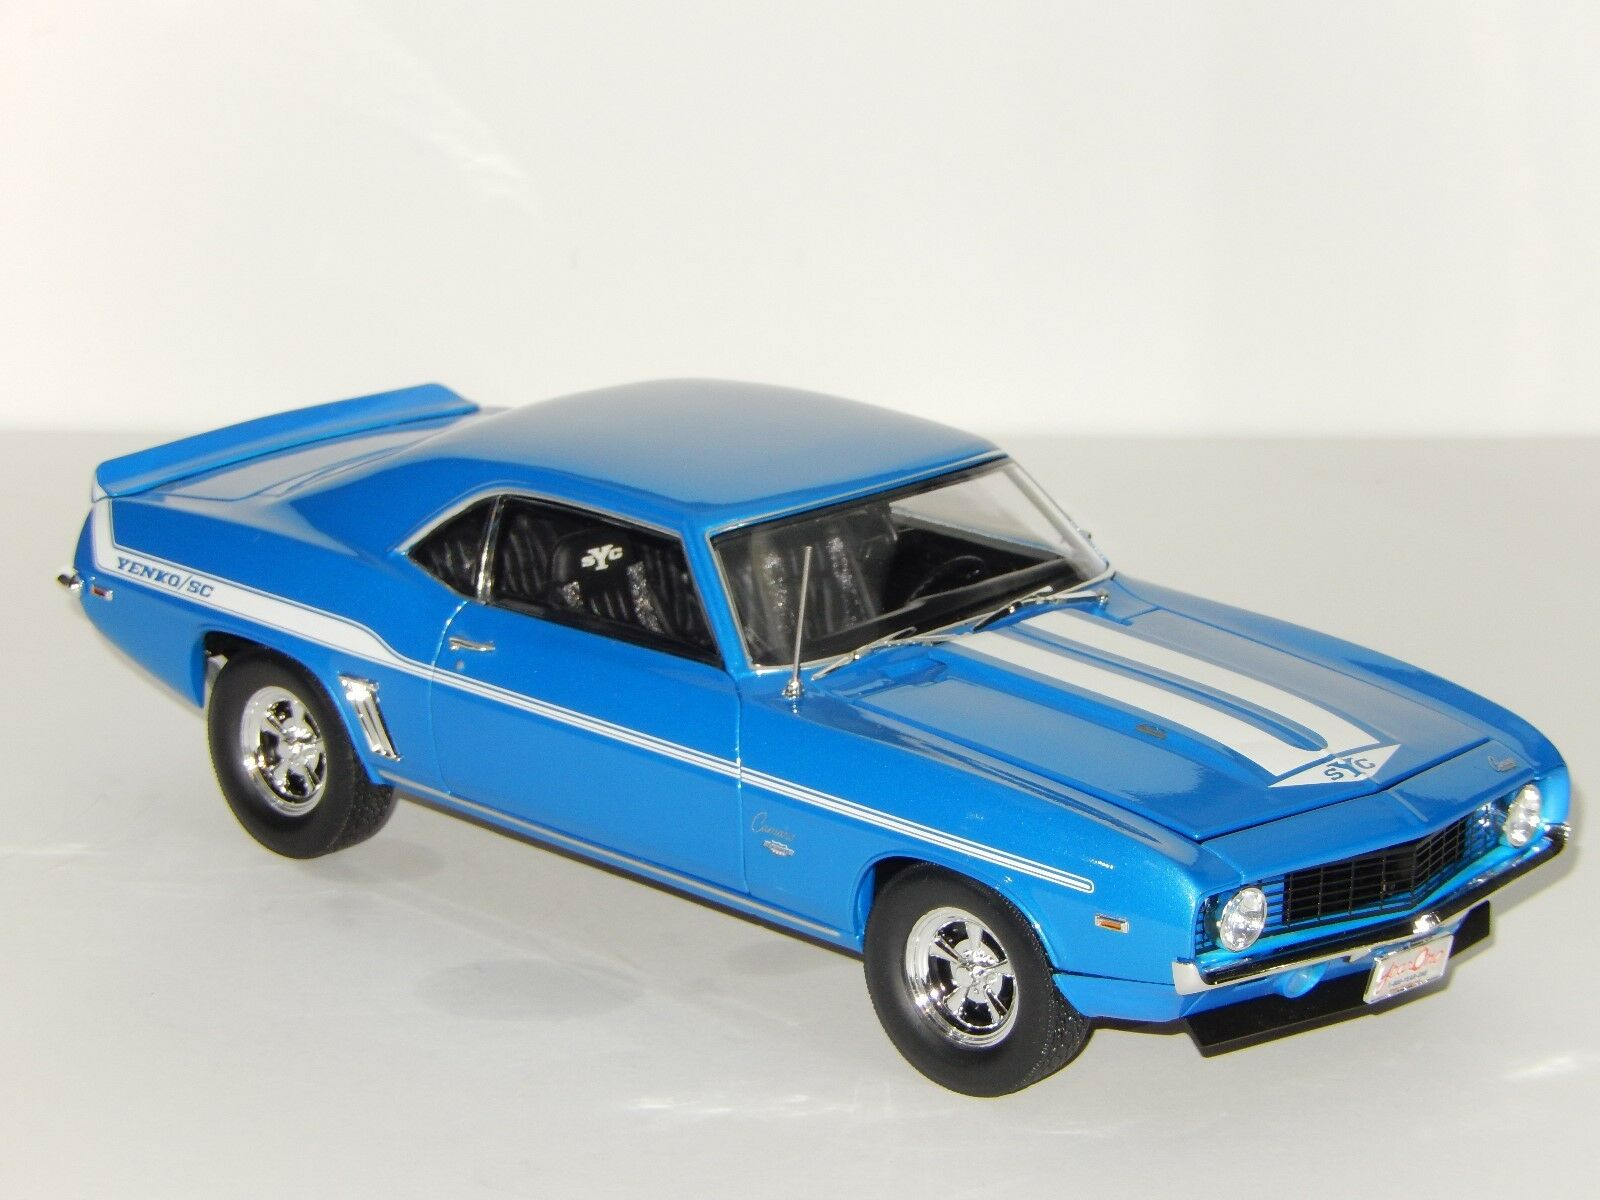 1 18 18 18 Scale Hwy-61 1969 Fast & Furious Chevrolet Yenko Camaro , Item HWY-18001 9c00b0